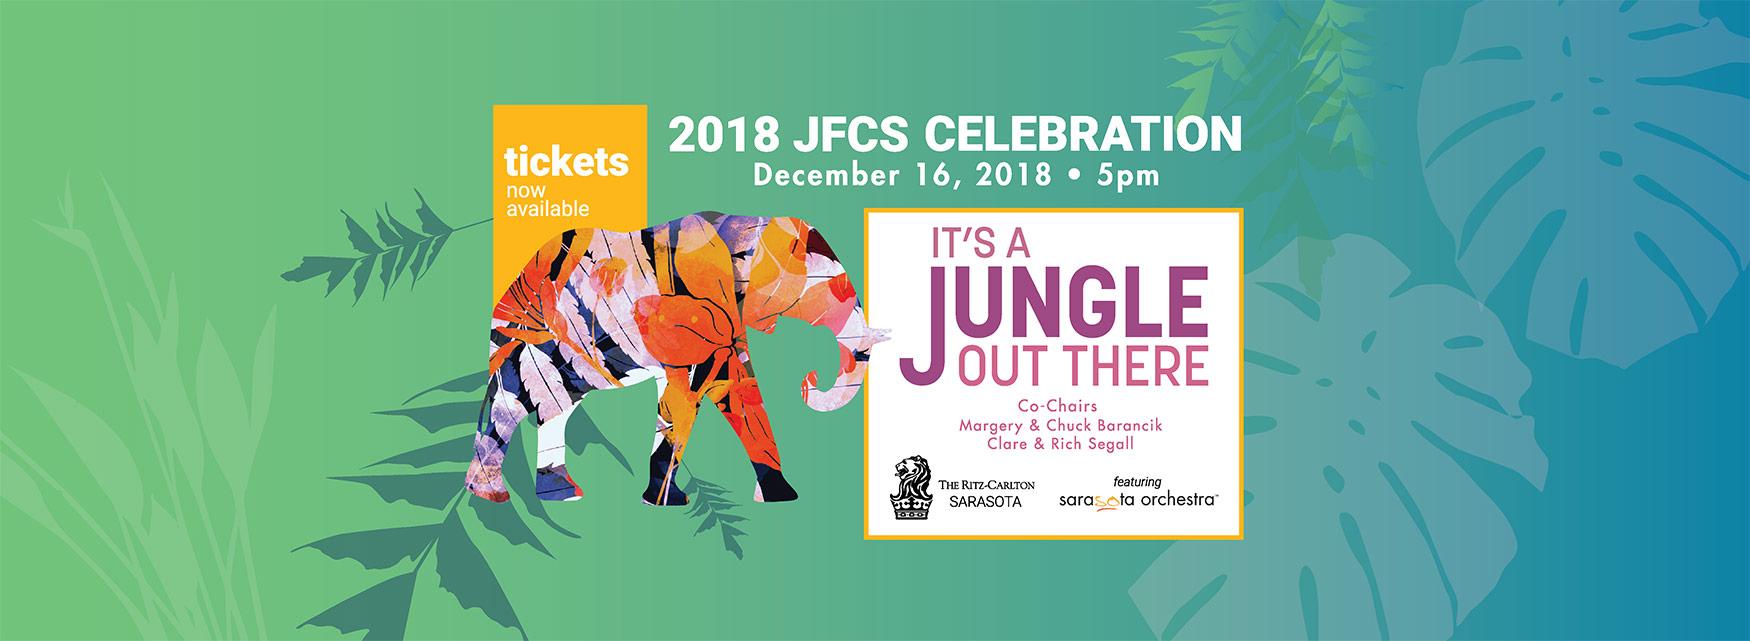 JFCS Celebration Gala 2018